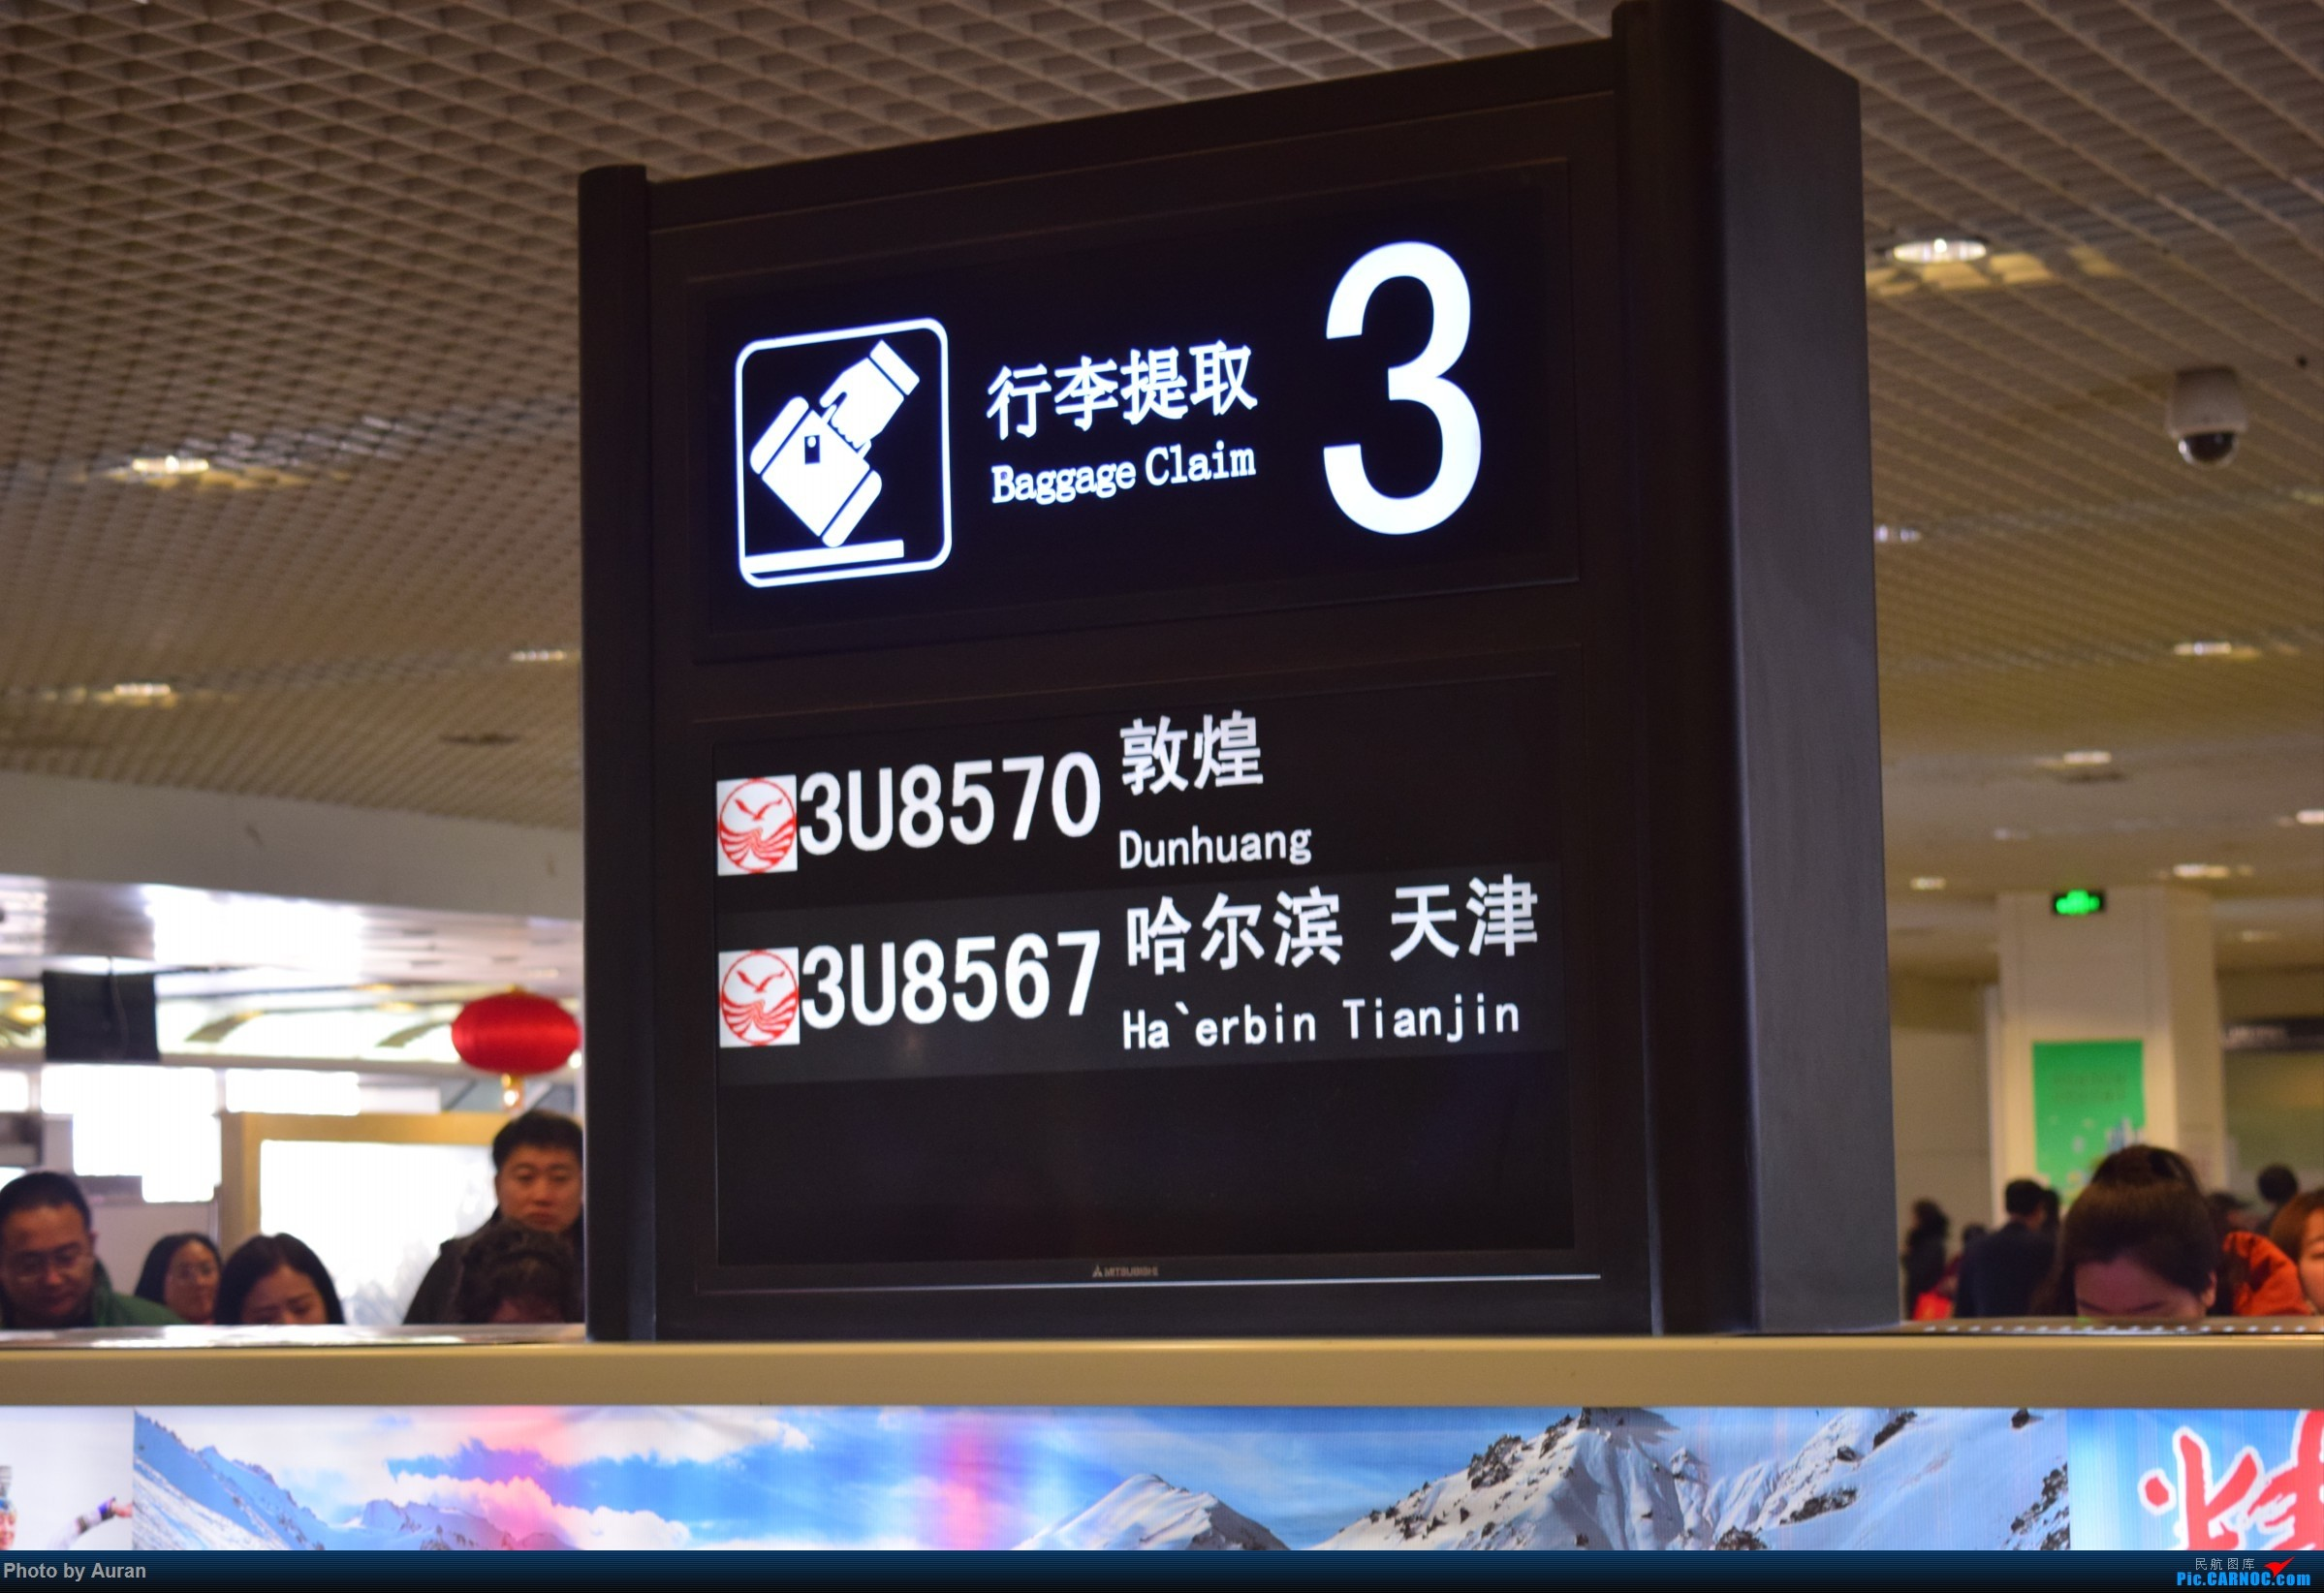 Re:[原创]【Auran游记2】陇秦之旅 AIRBUS A320 B-1821 TSN 中国兰州中川国际机场